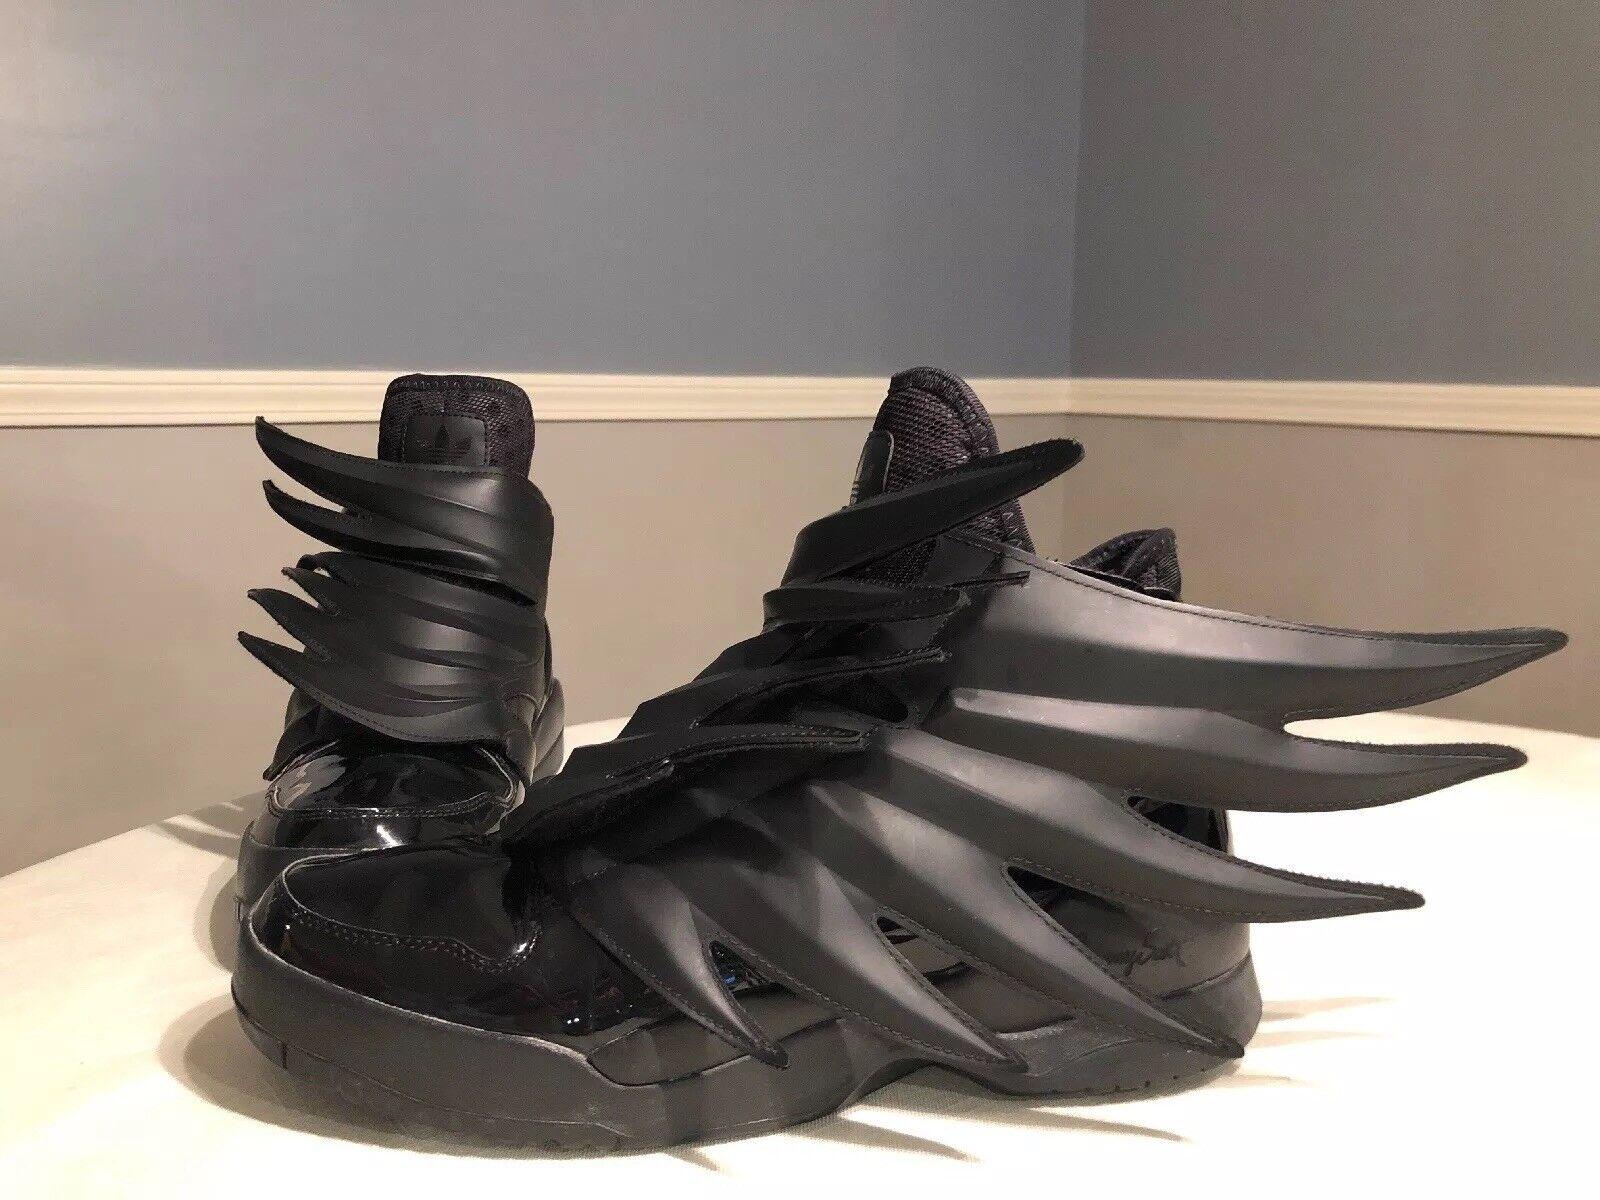 Adidas, Jeremy Scott Wings 3.0, Dark Knight, Batman, Size 9.5, RARE